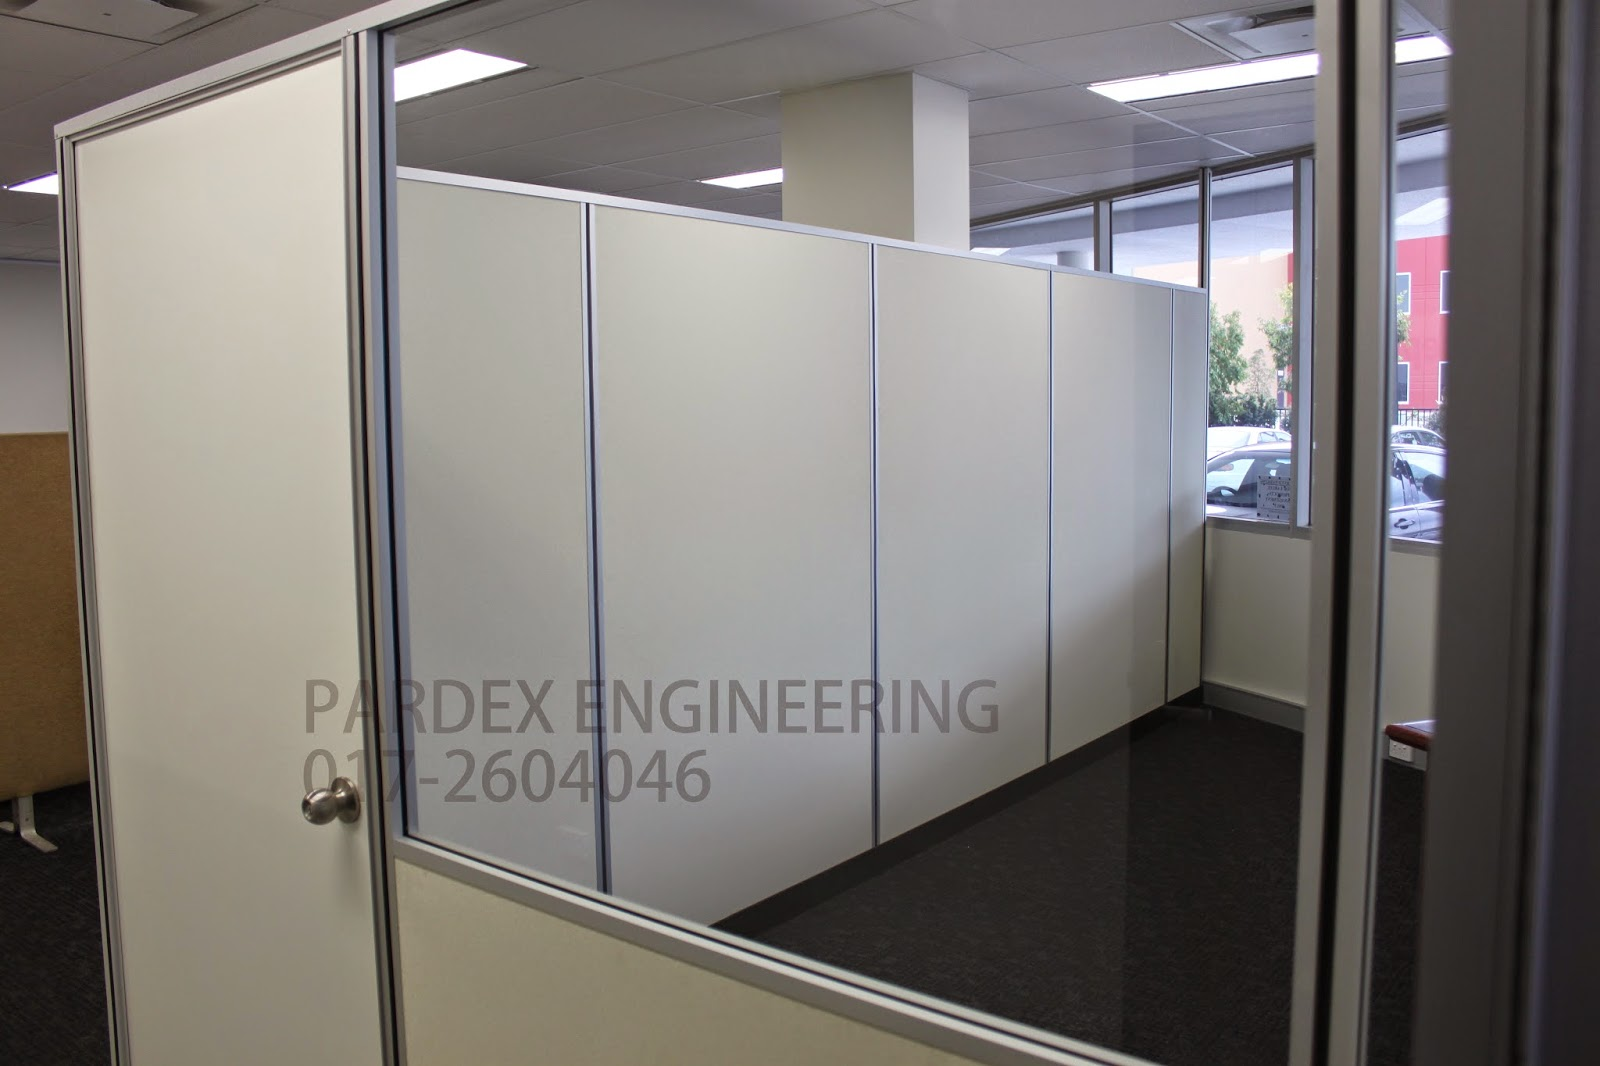 Pardex Engineering